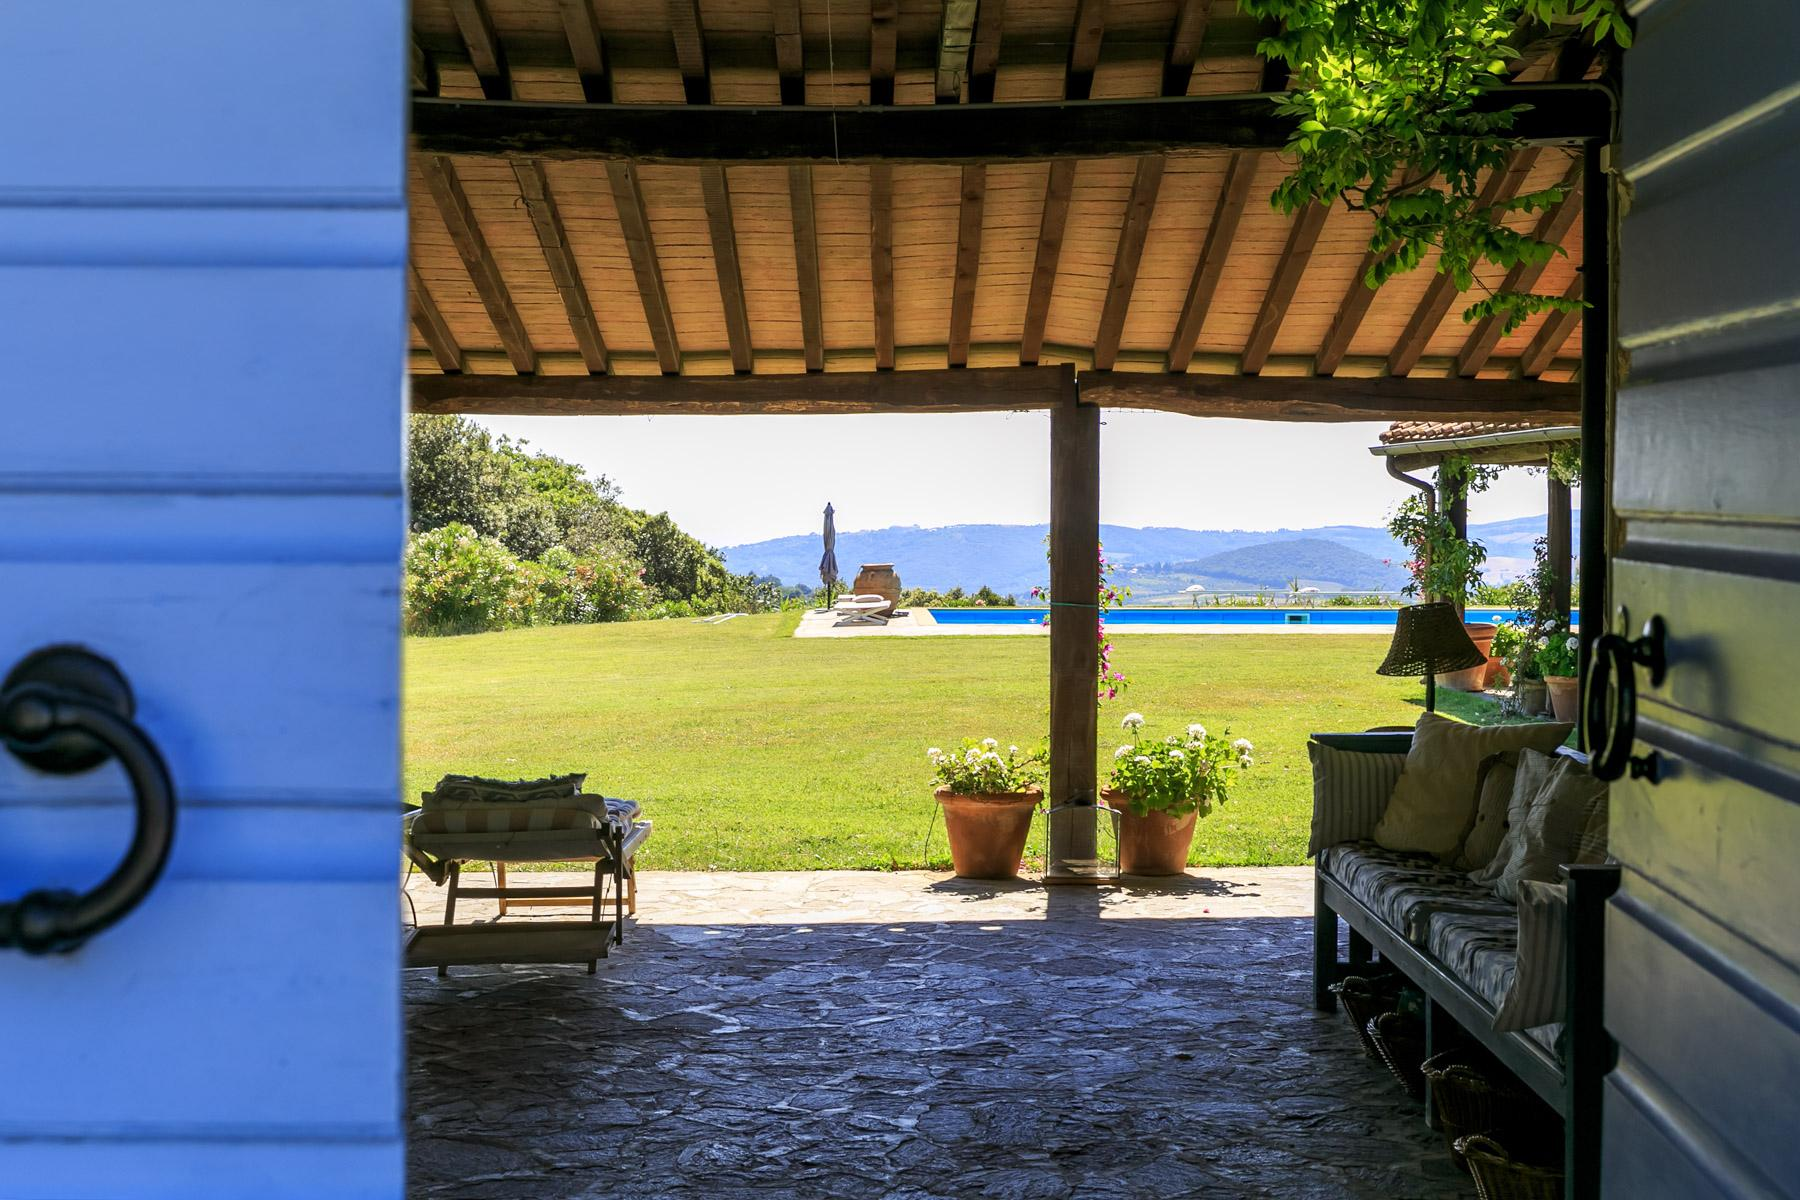 Belle villa toscane avec piscine - 20